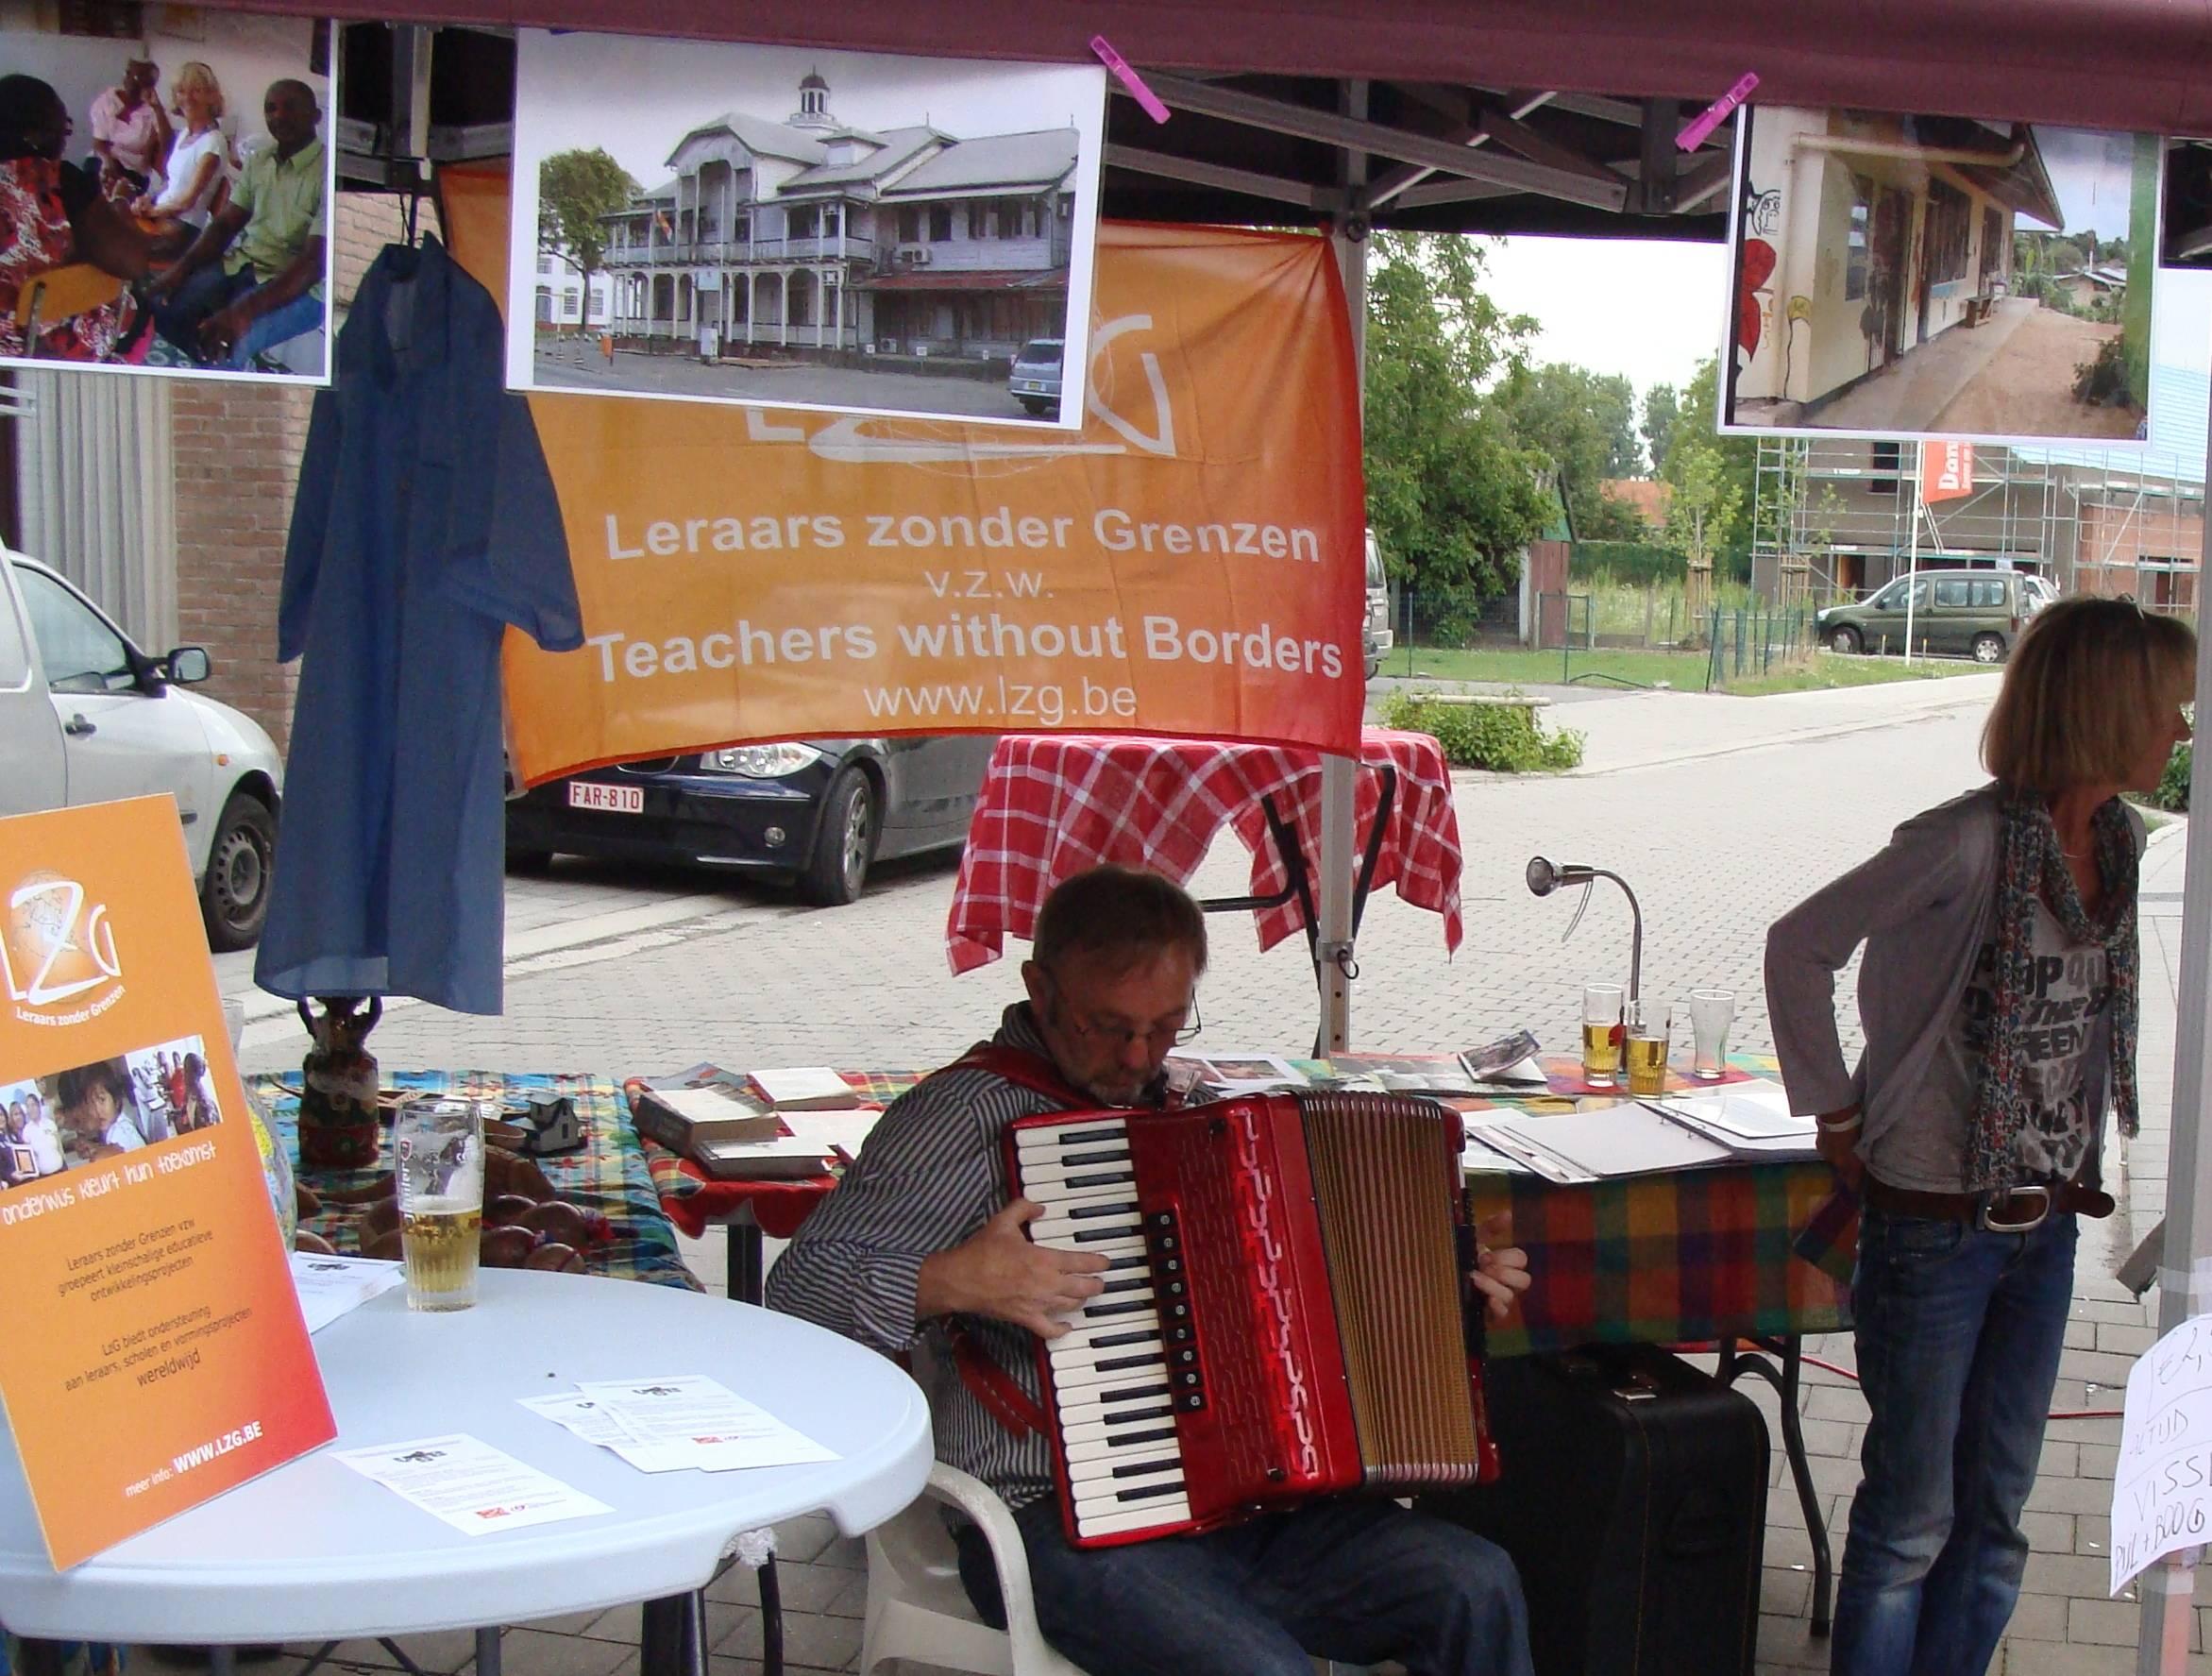 Muzikale stand met Jan Rigo op accordeon